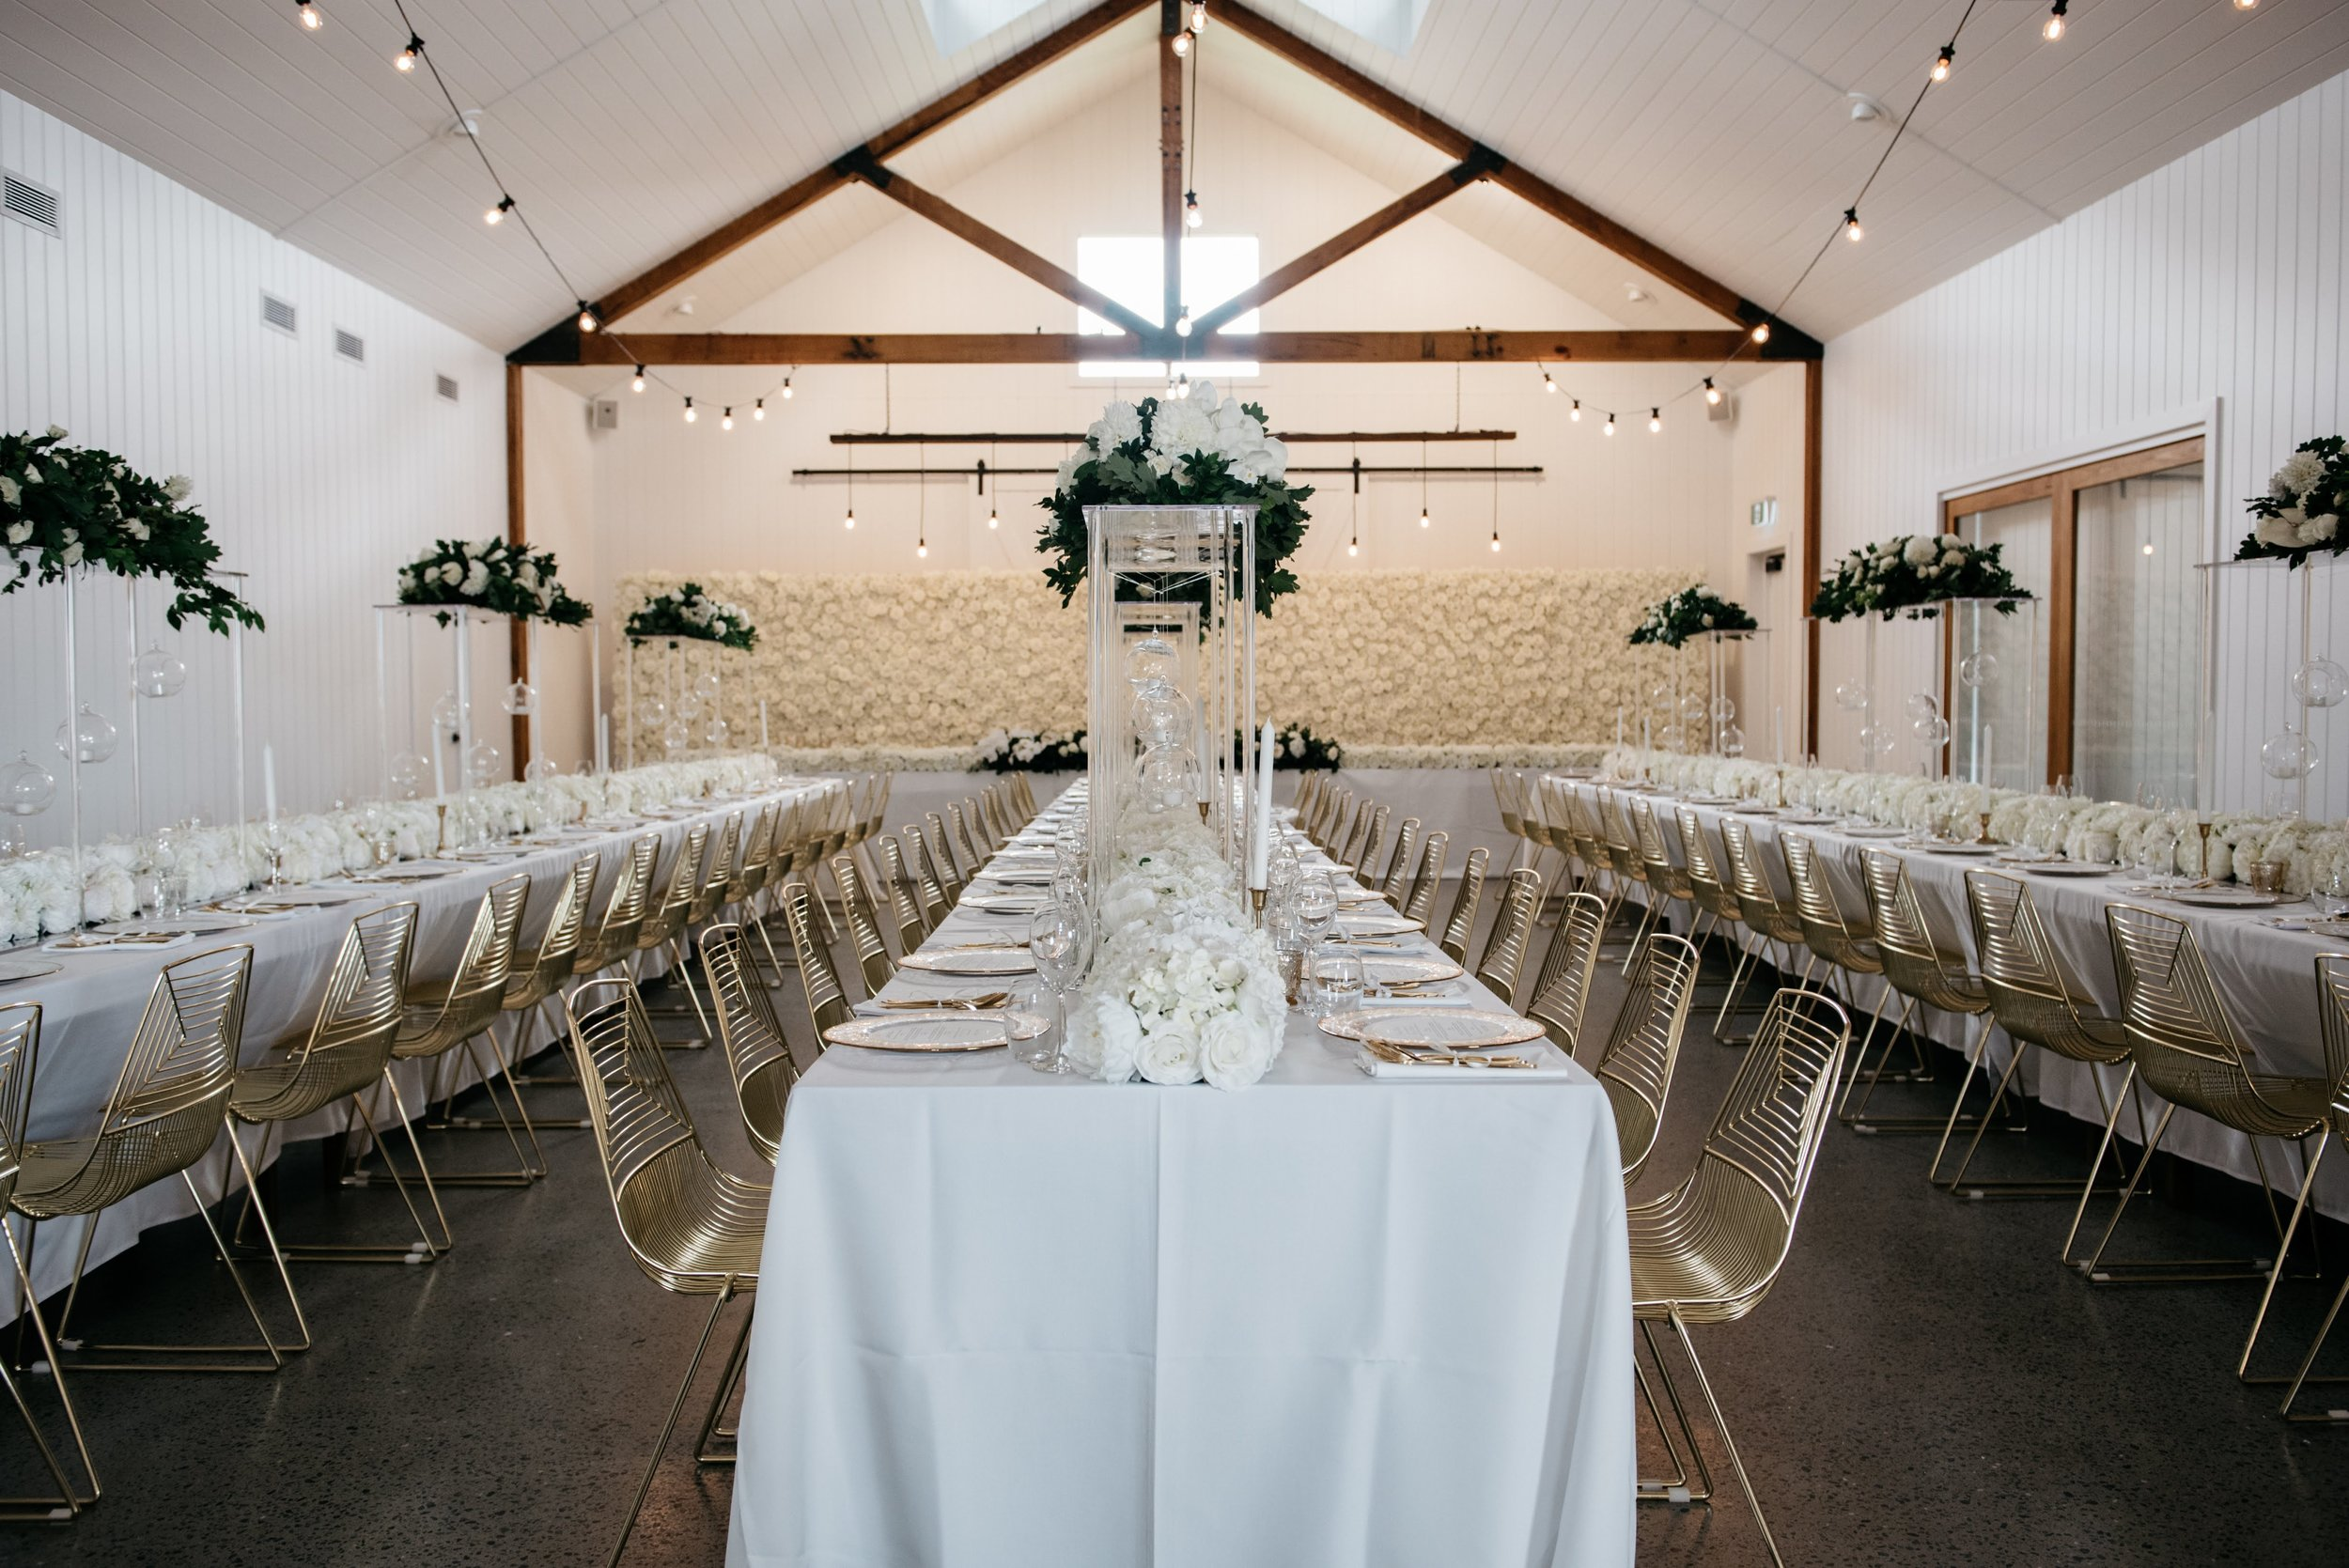 Real Wedding Reception at Summergrove Estate Barn, Hampton Event Hire Blog